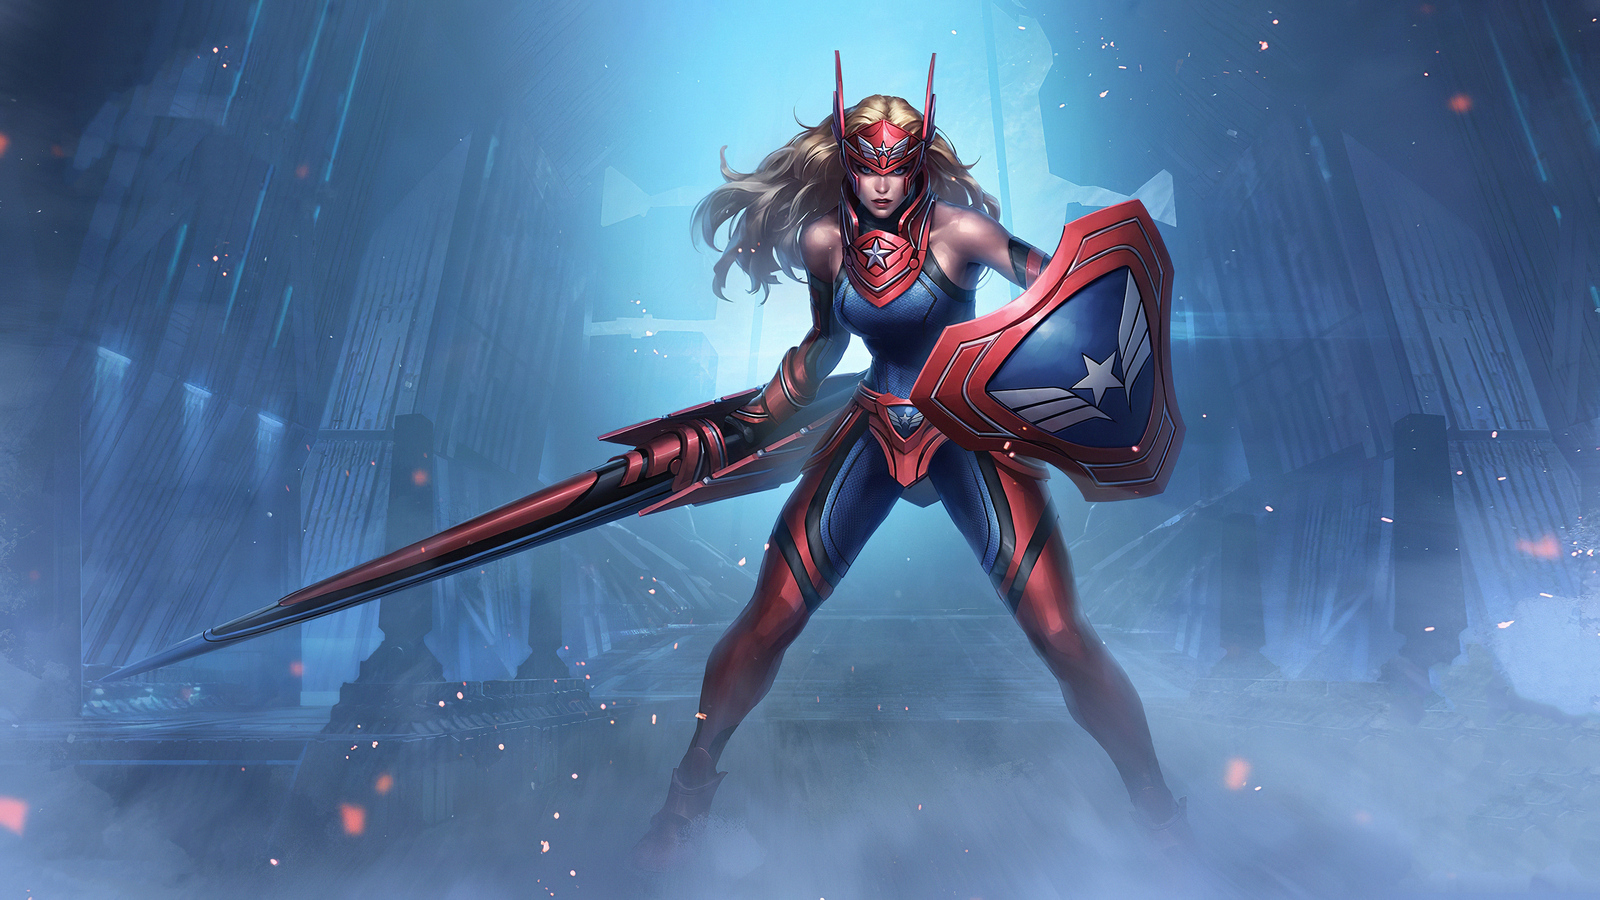 captain-america-girl-marvel-contest-of-champions-pc.jpg